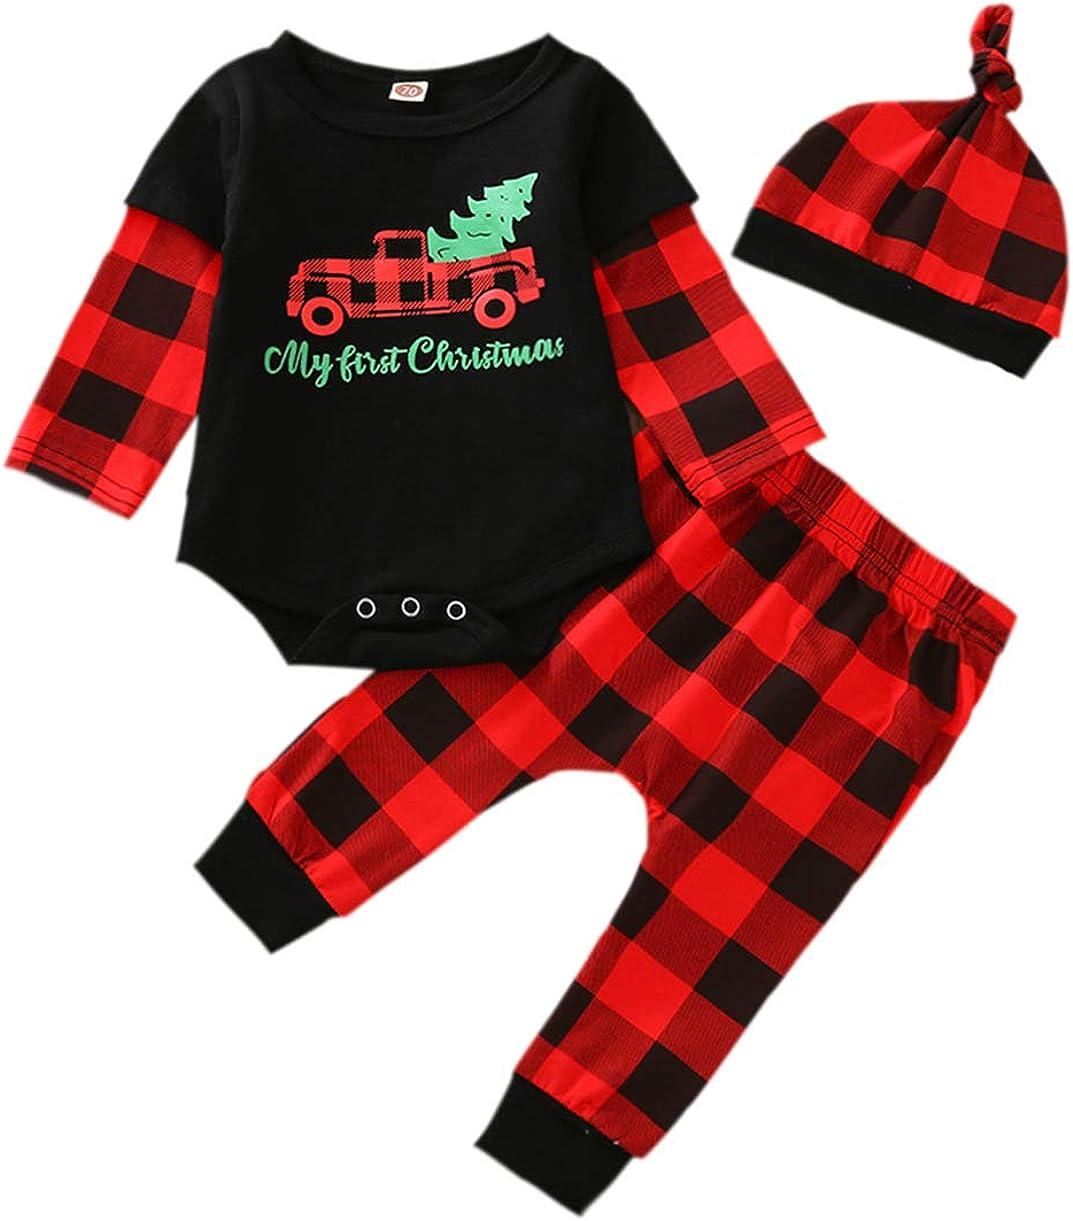 ALLTB Newborn Unisex Baby Cartoon Antlers Fleece Snowsuit Playsuit Infant Winter Christmas Warm Footie Hoodie Jumpsuit Romper